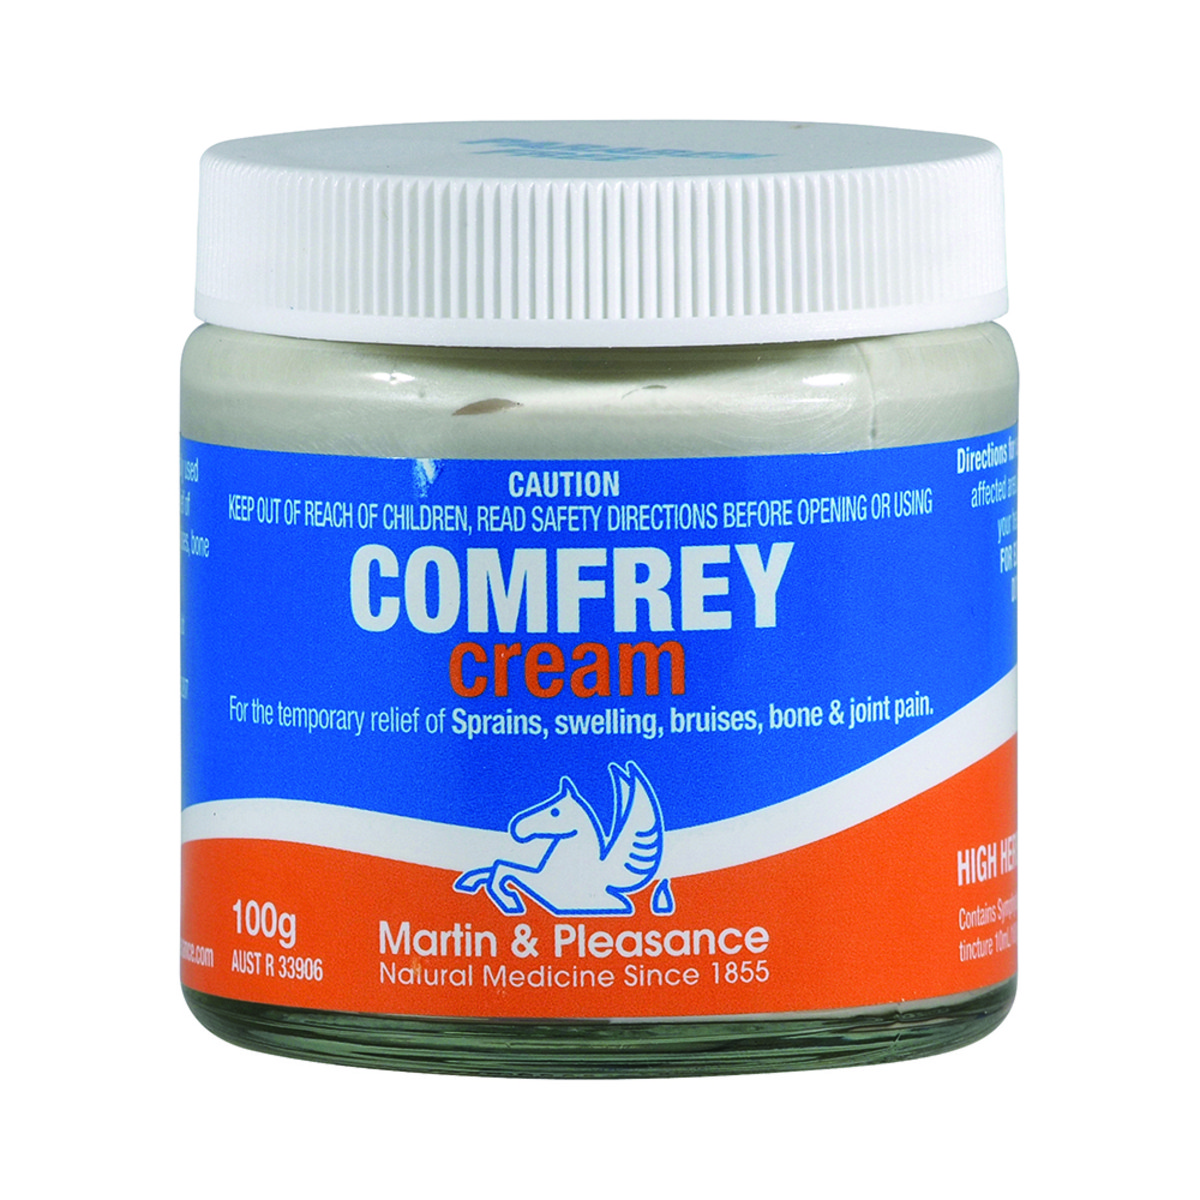 Image of Martin & Pleasance Comfrey cream 100g